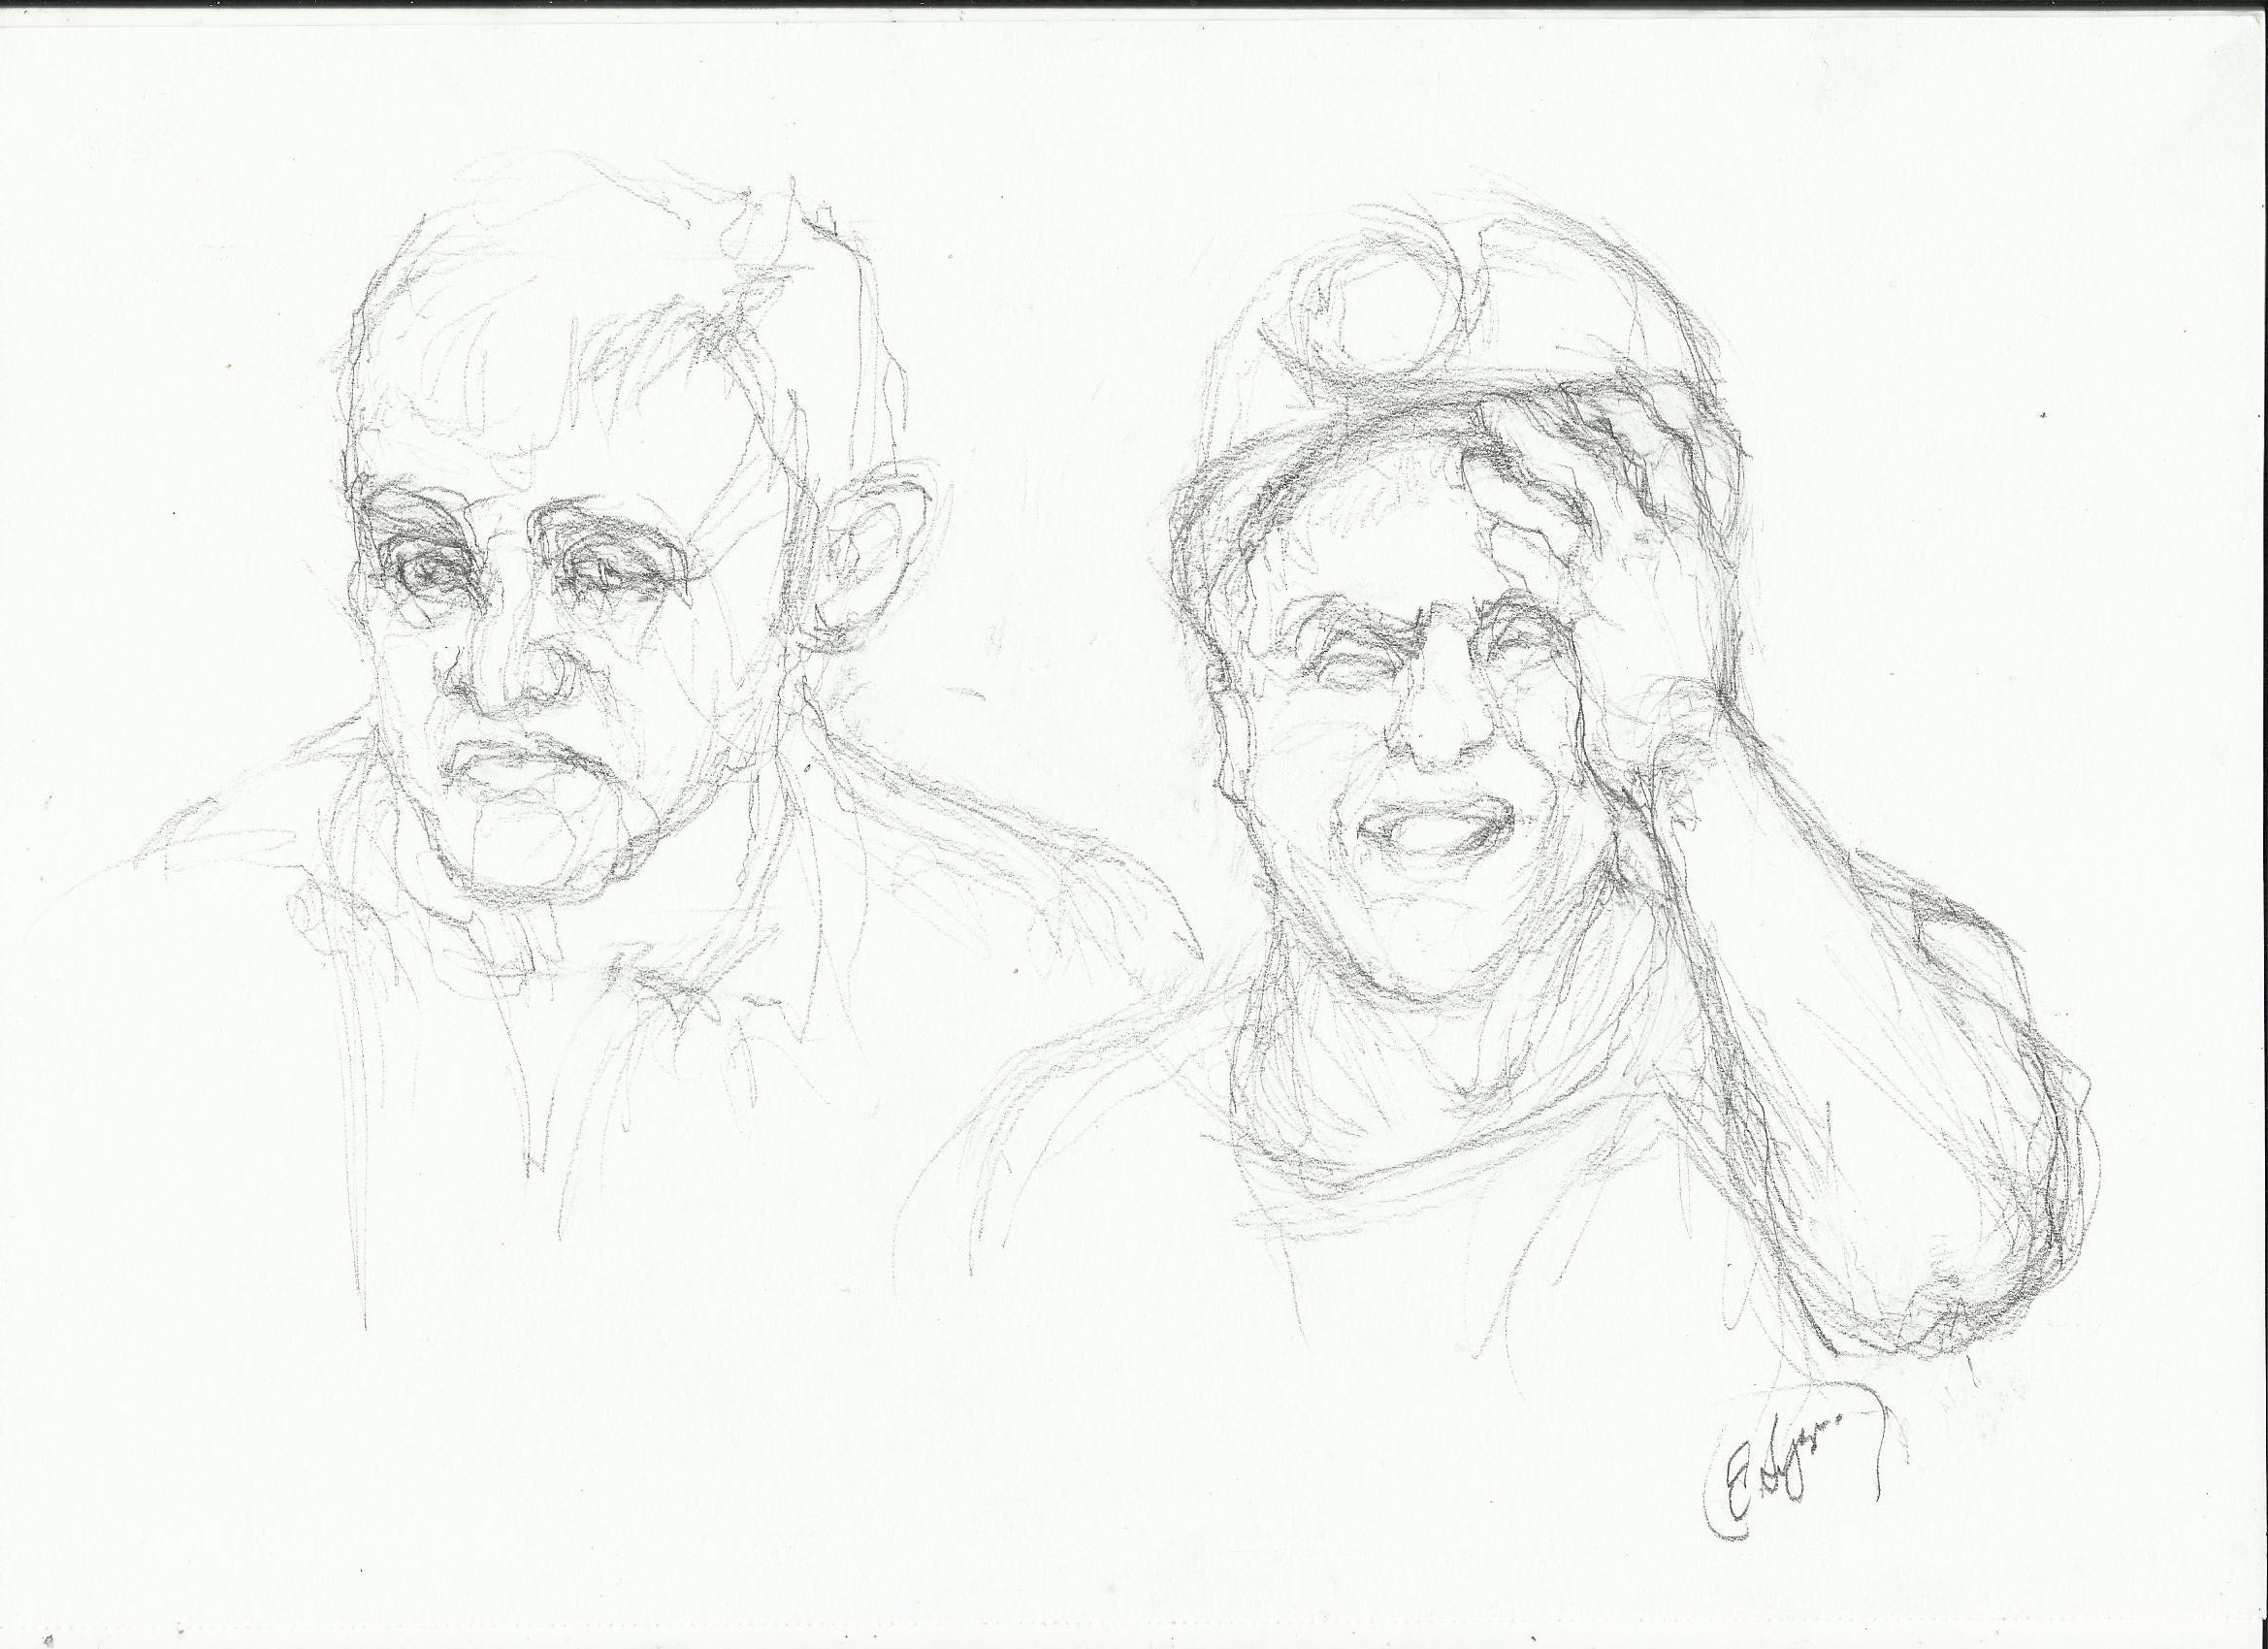 2338x1700 Sketch Nightwithdeer Page 5